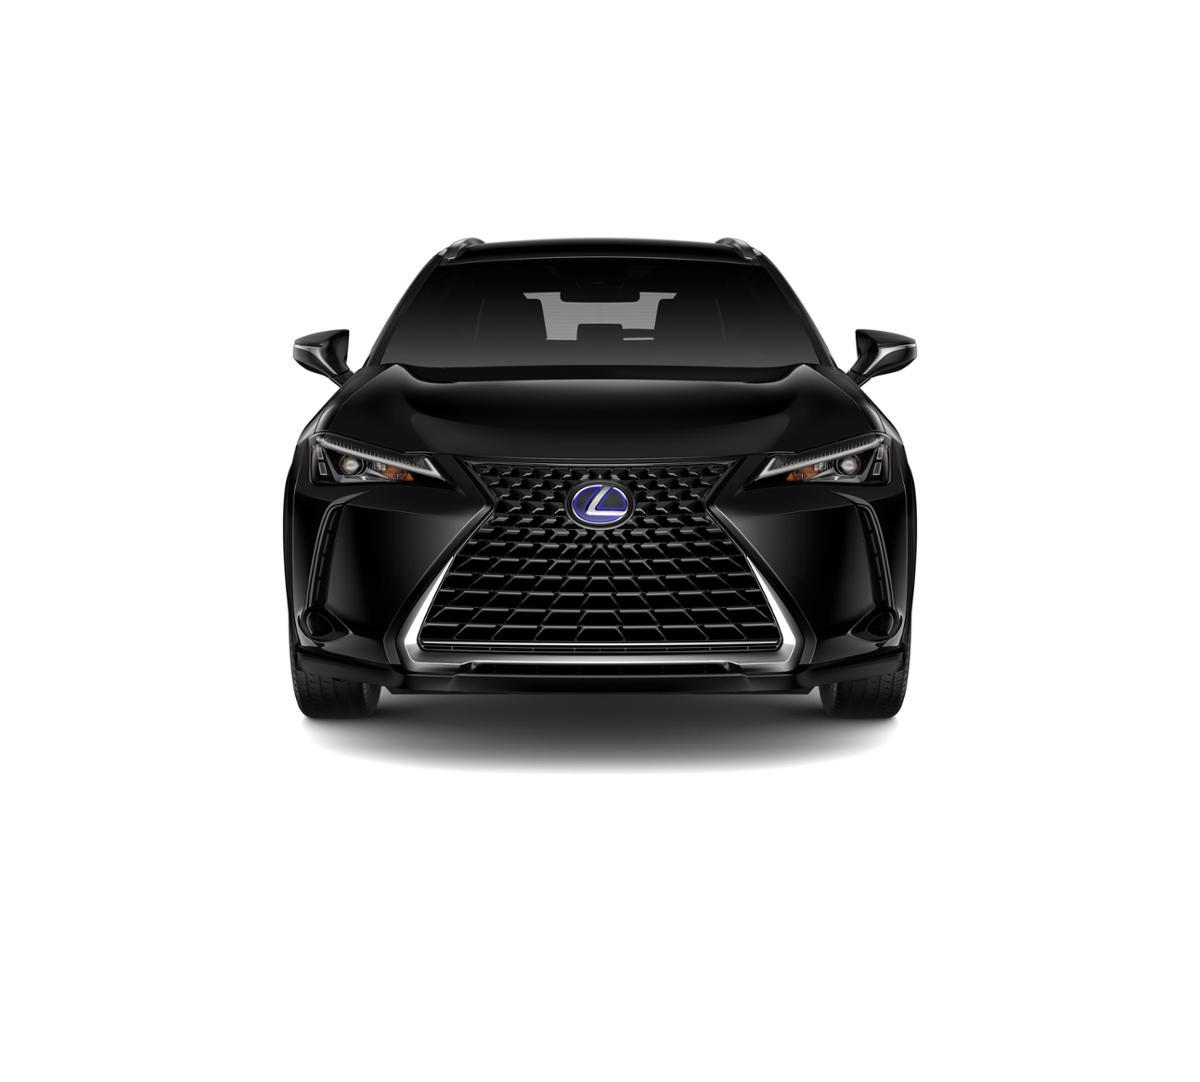 2019 Lexus UX 250h Vehicle Photo in Bedford, NH 03110